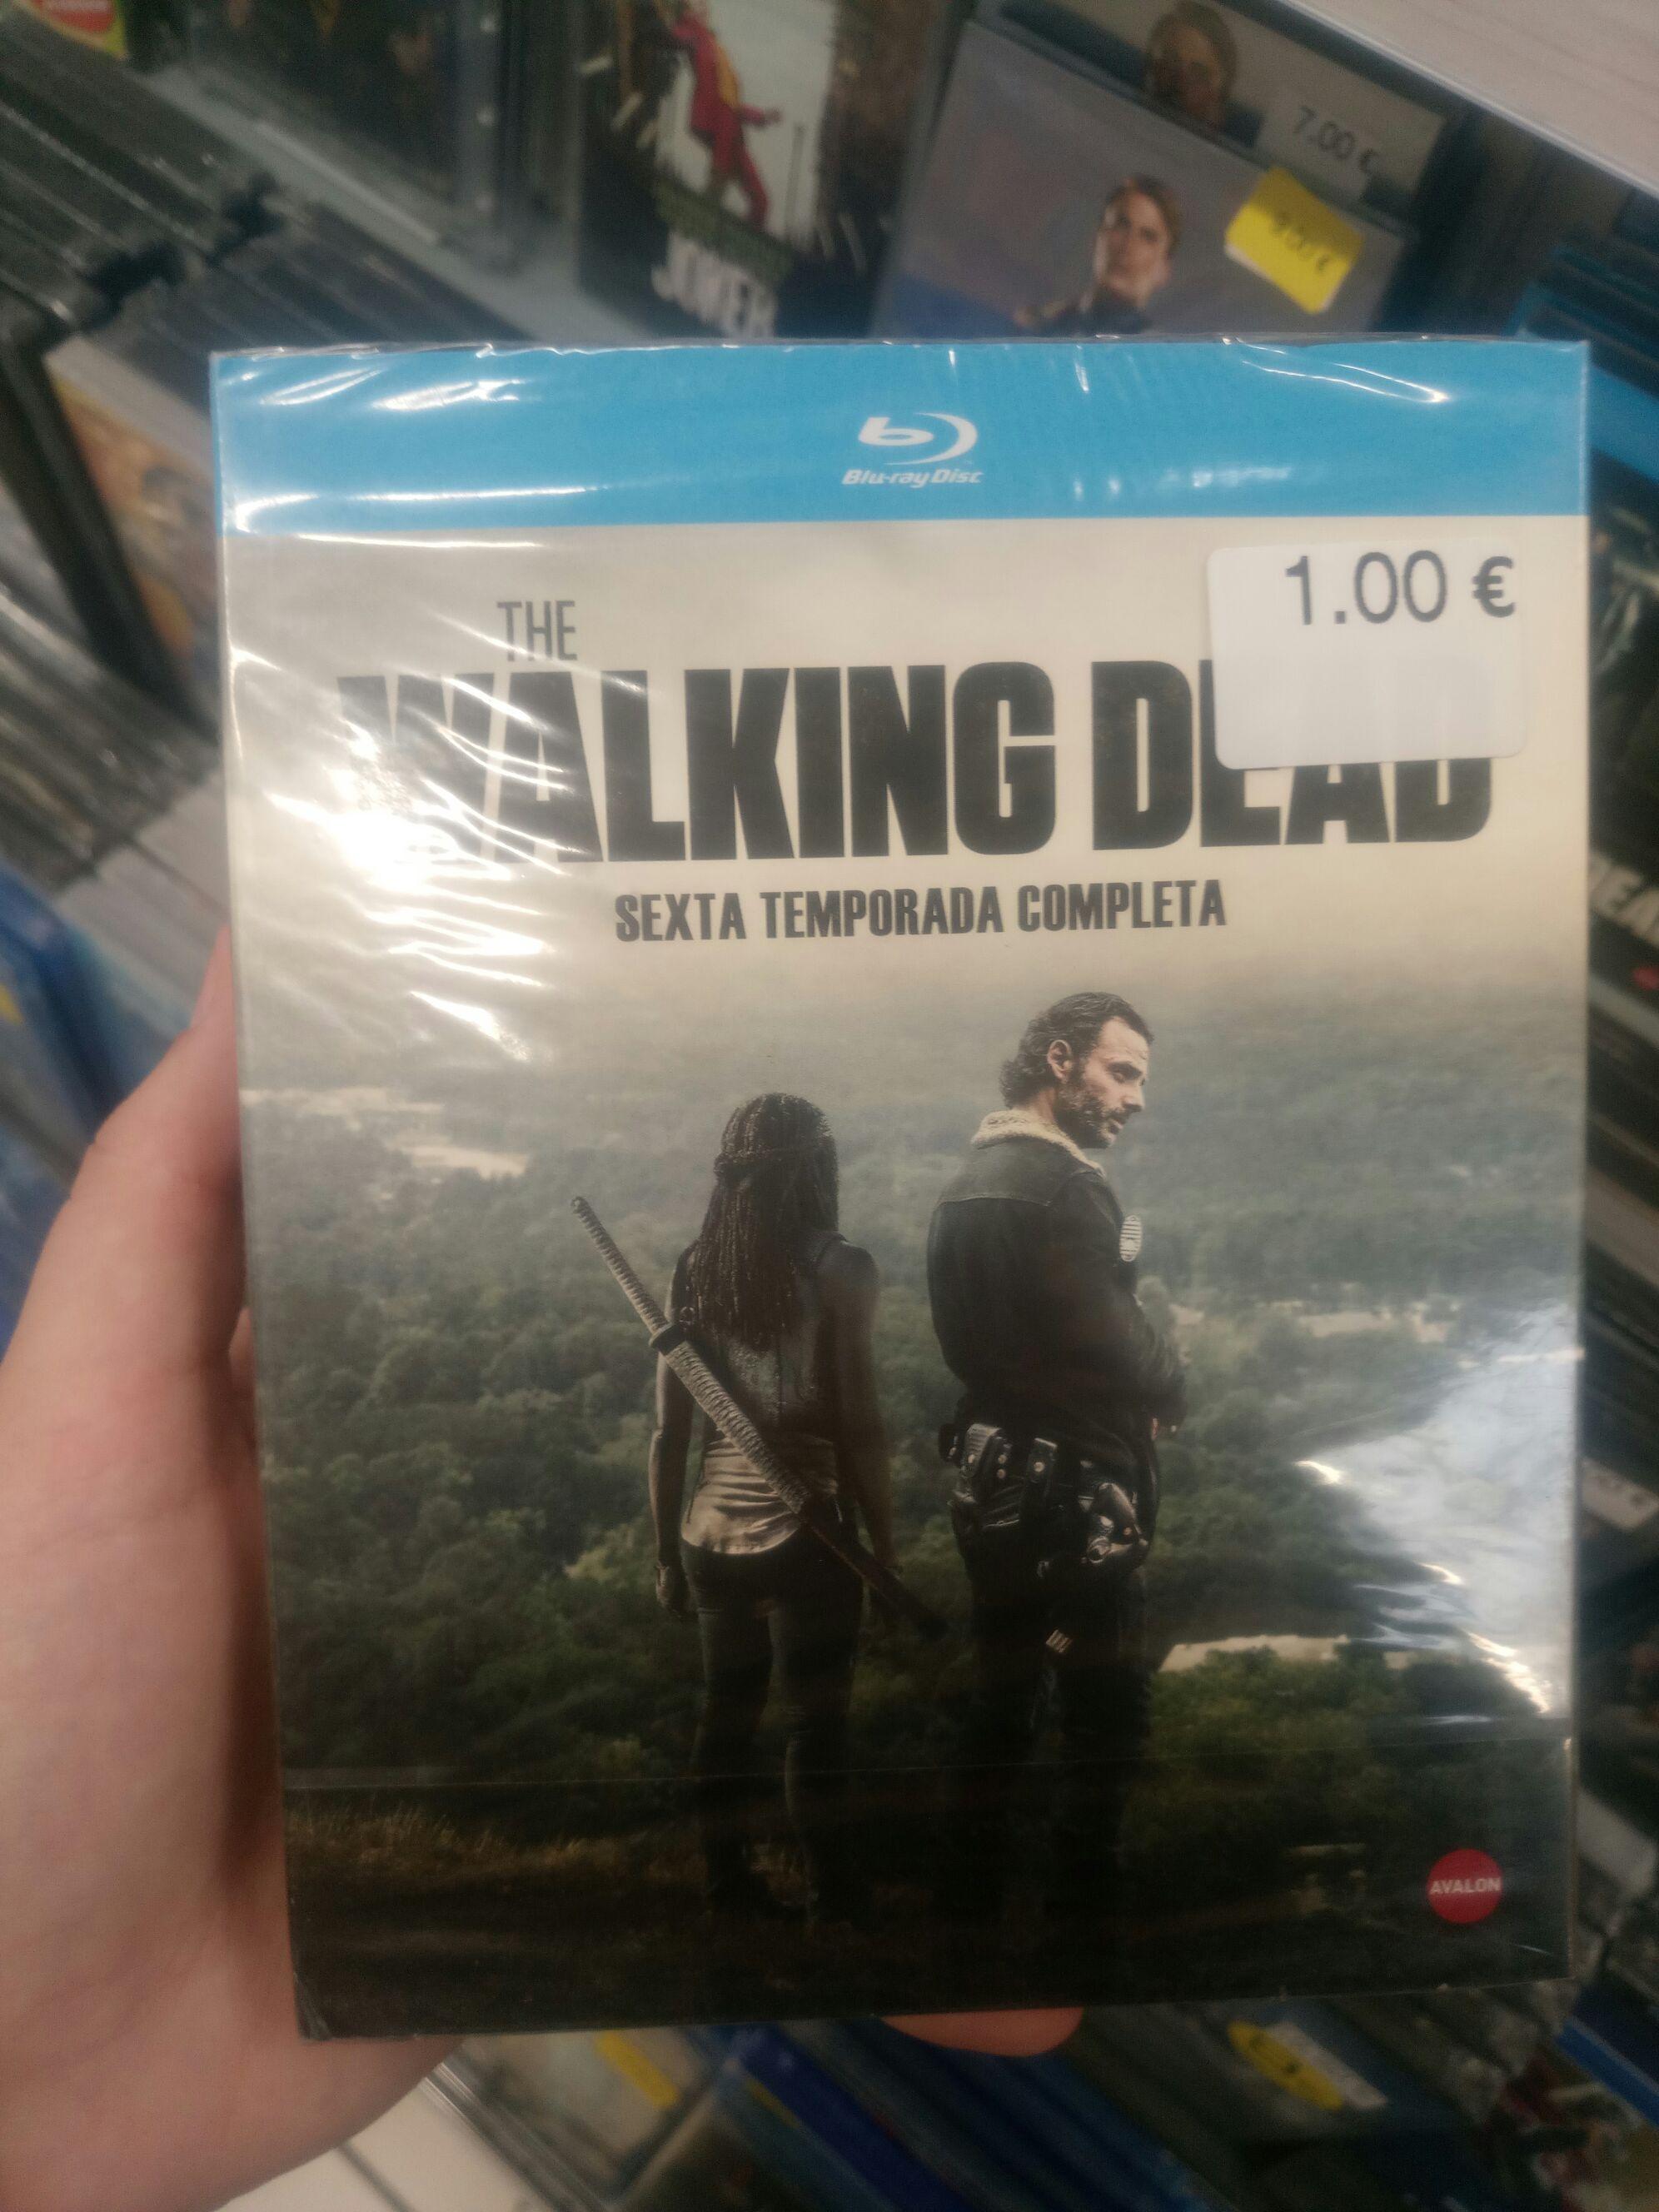 The Walking Dead, Temporada 6 Completa en Blu-ray, CARREFOUR MONTEQUINTO (SEVILLA)